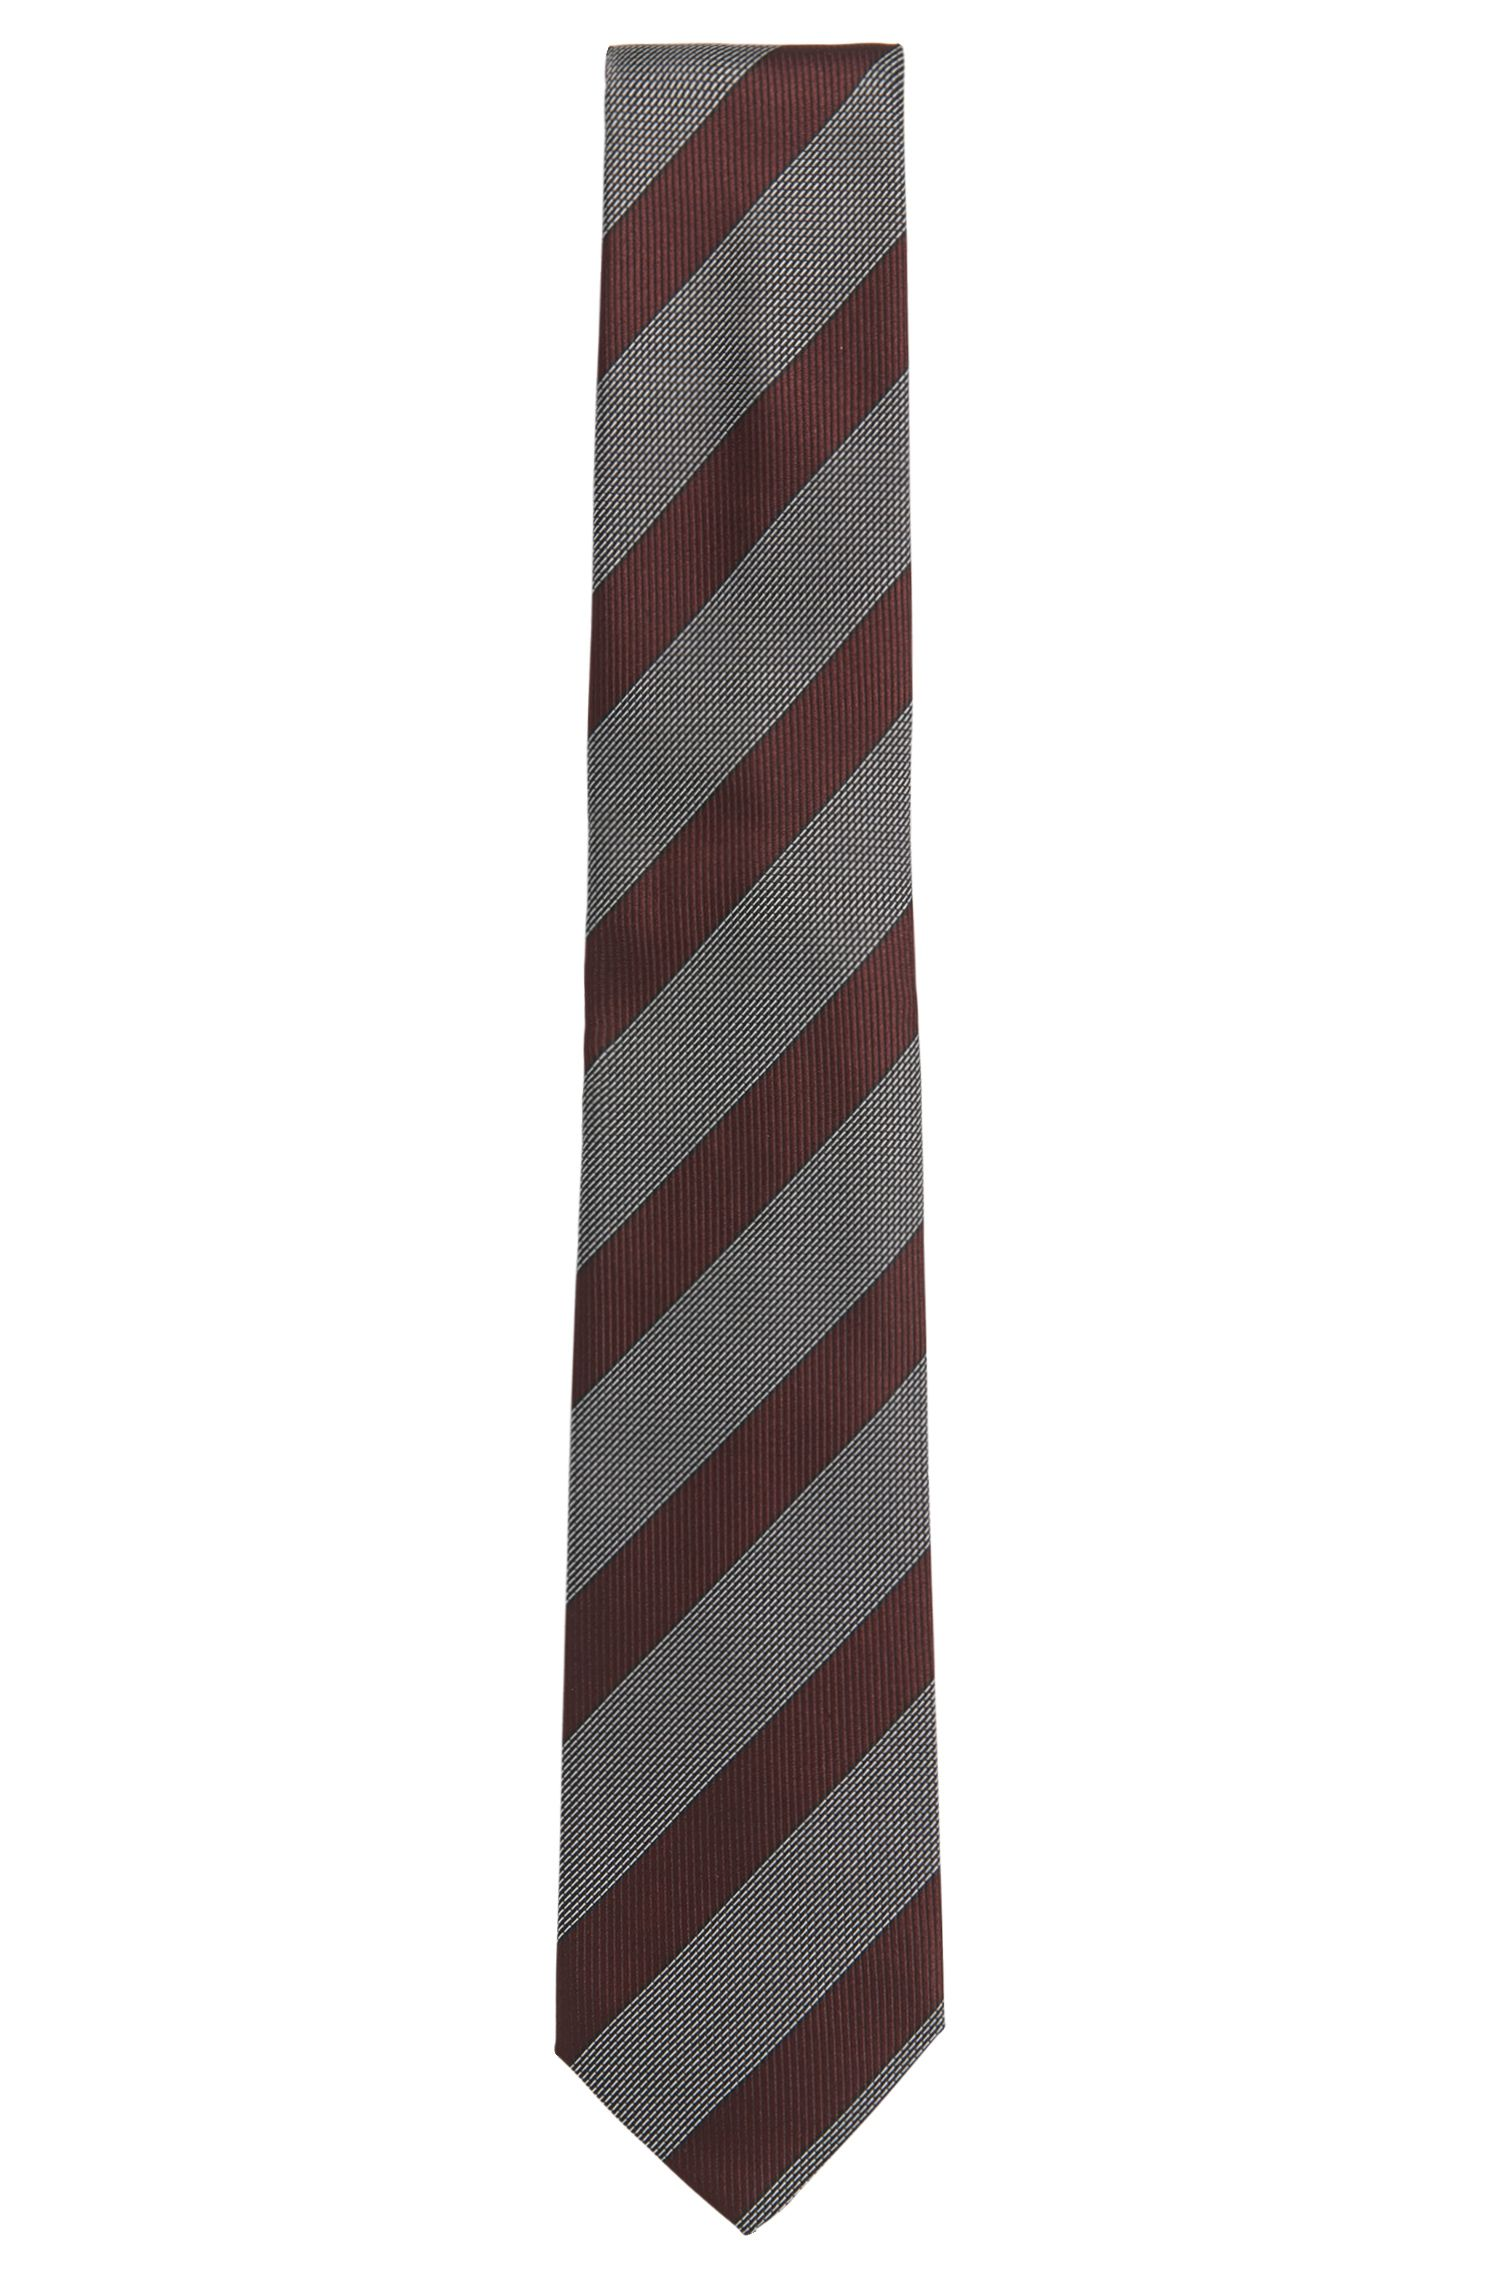 Gestreifte Tailored Seidenkrawatte: T-Tie 7,5 cm'